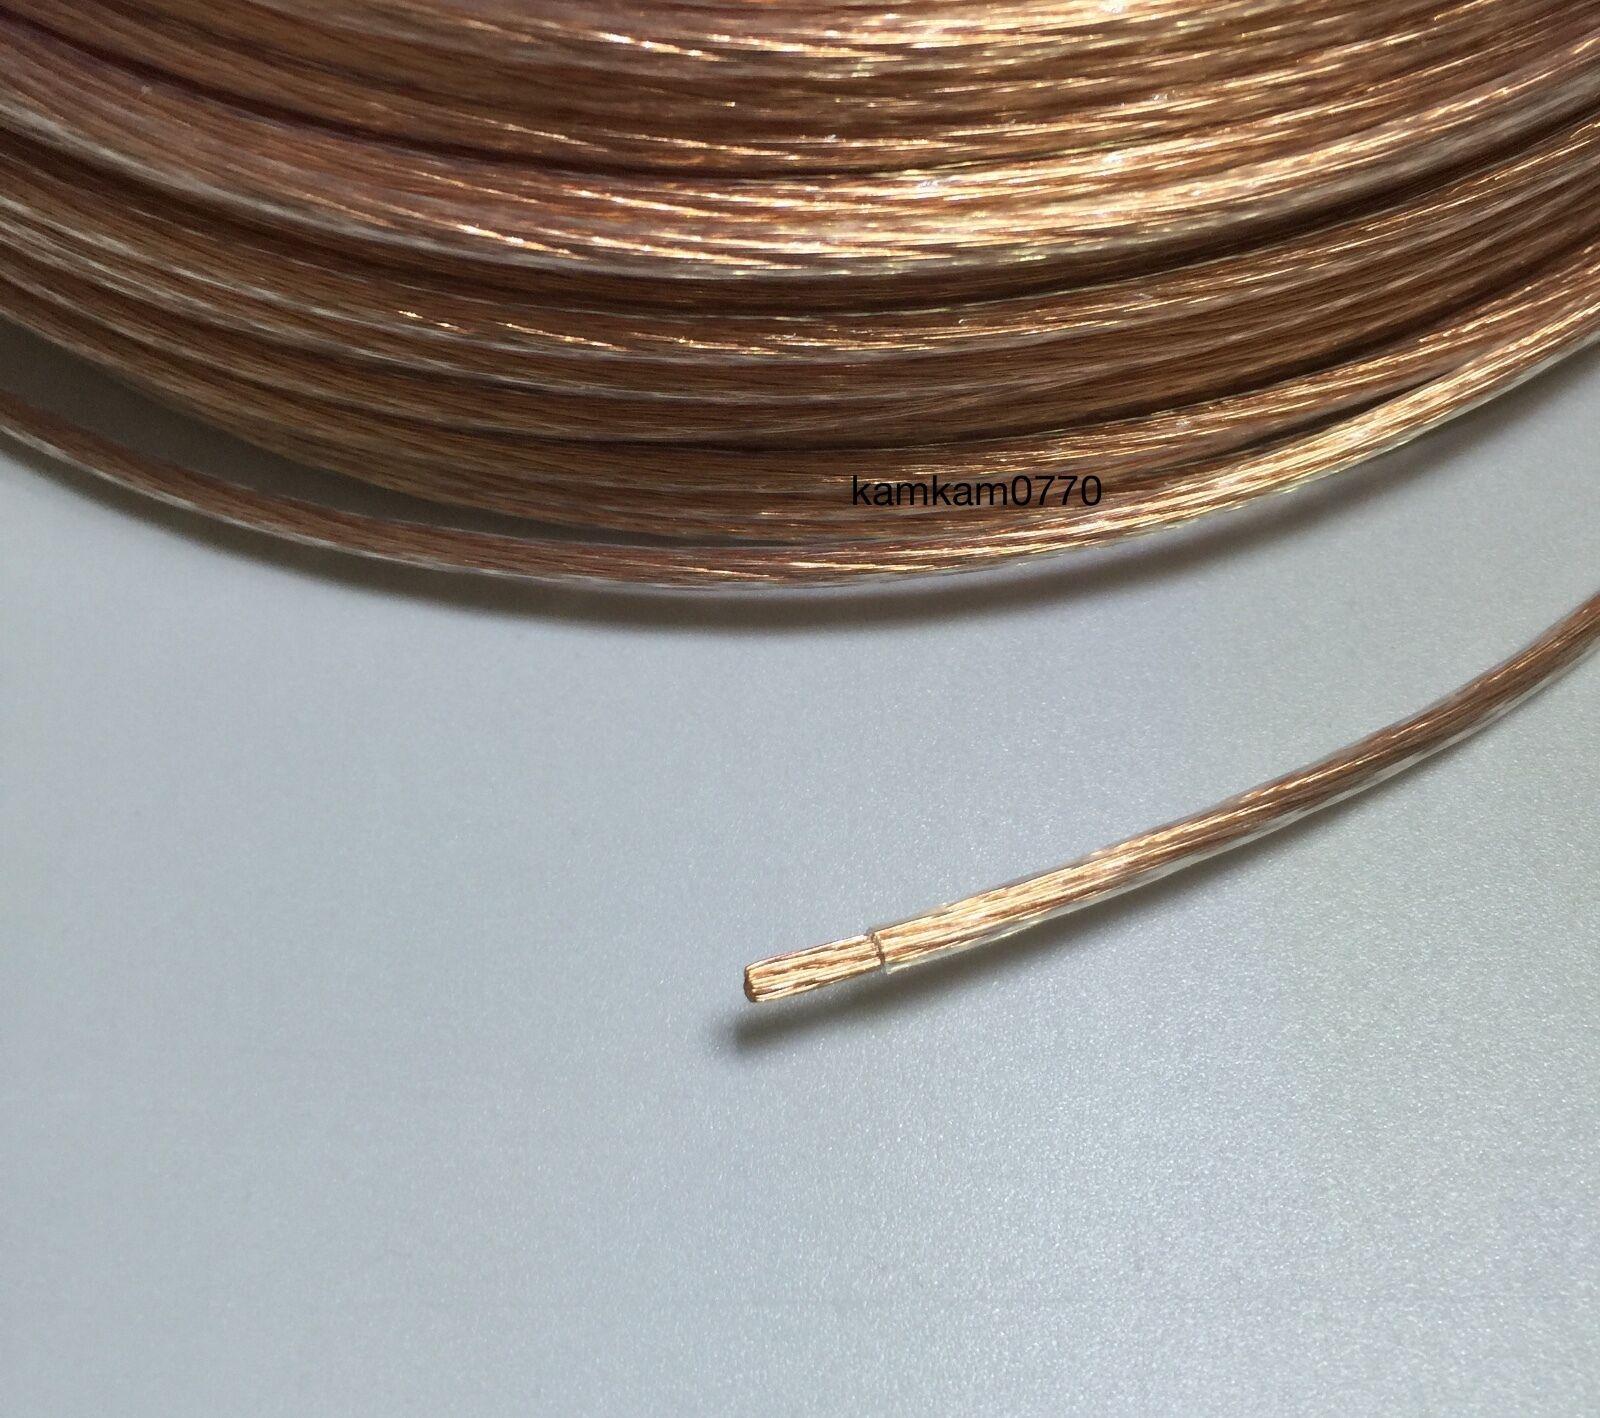 10m Vanguard Acoustics 0.75mm Square 6n OCC Copper Wire DIY Hi Fi ...